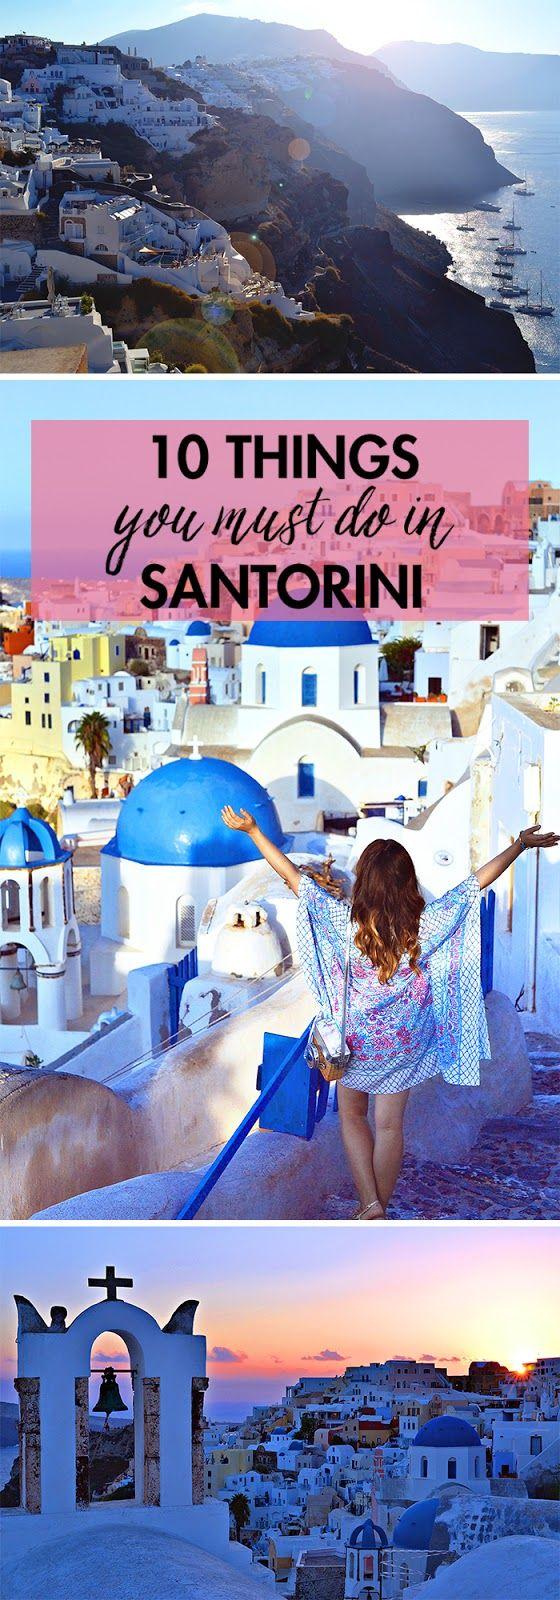 10 Things You Must Do in Santorini - History In High Heels